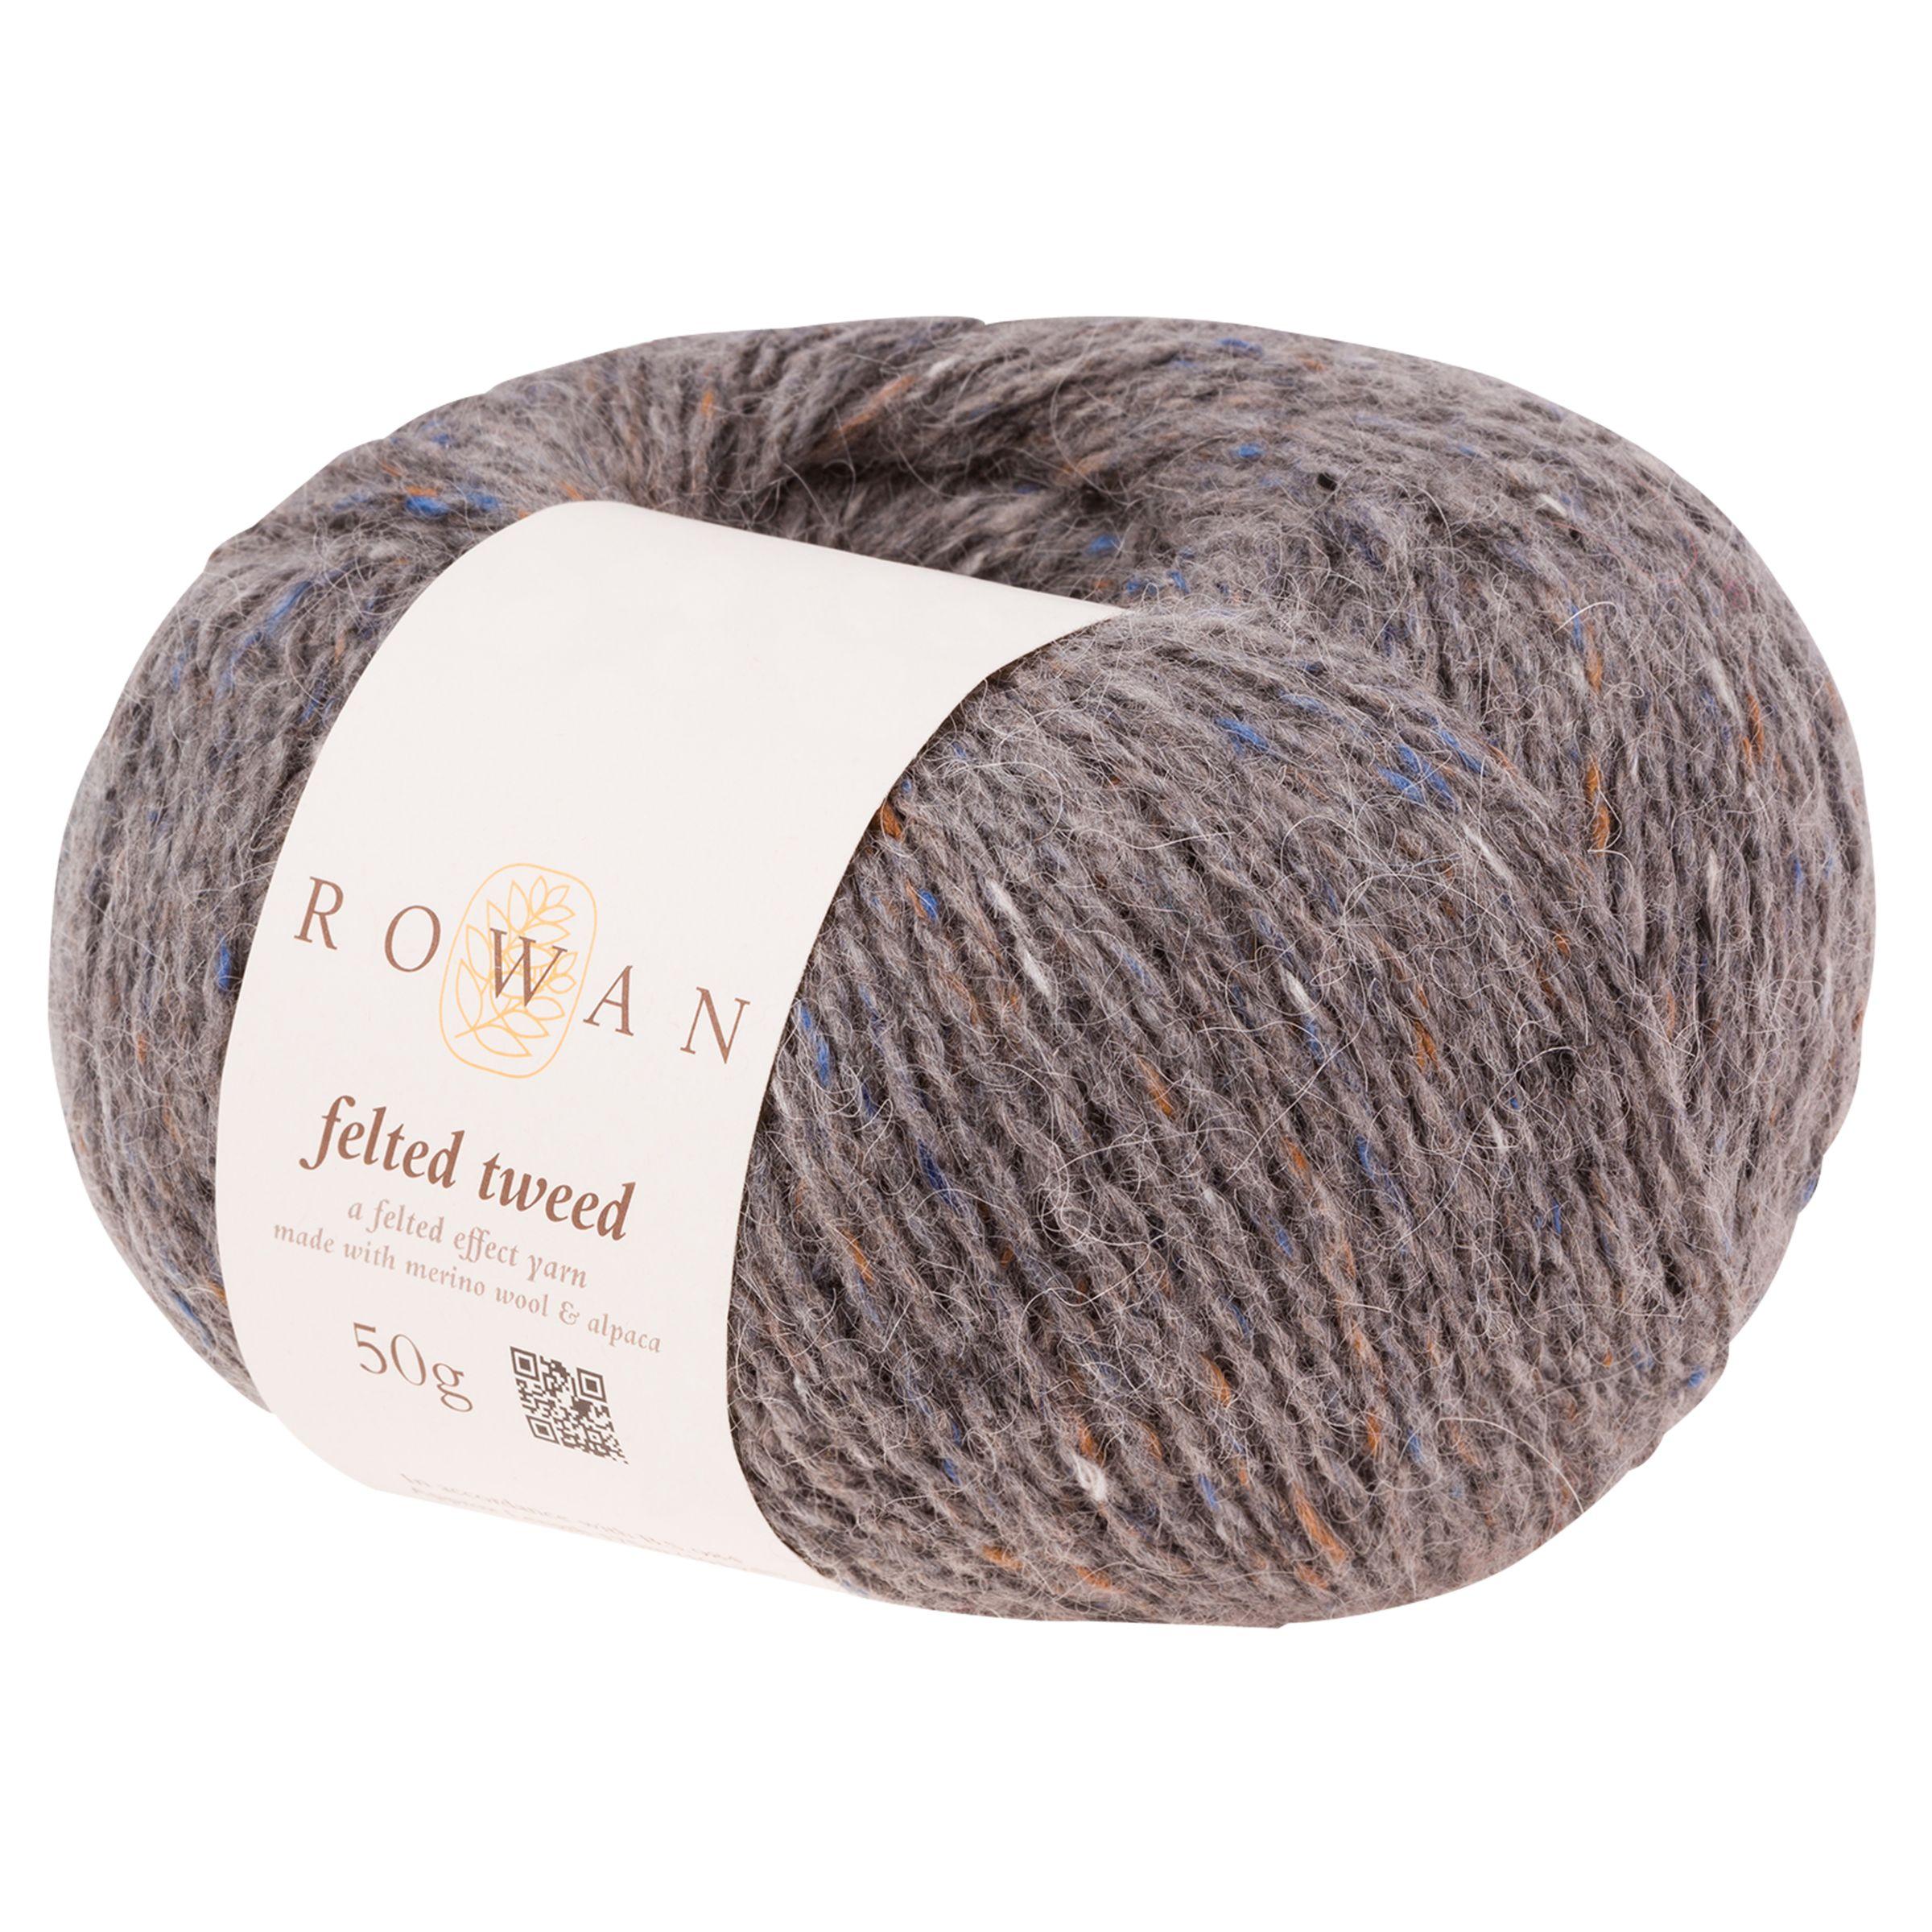 Rowan Rowan Felted Tweed DK Yarn, 50g